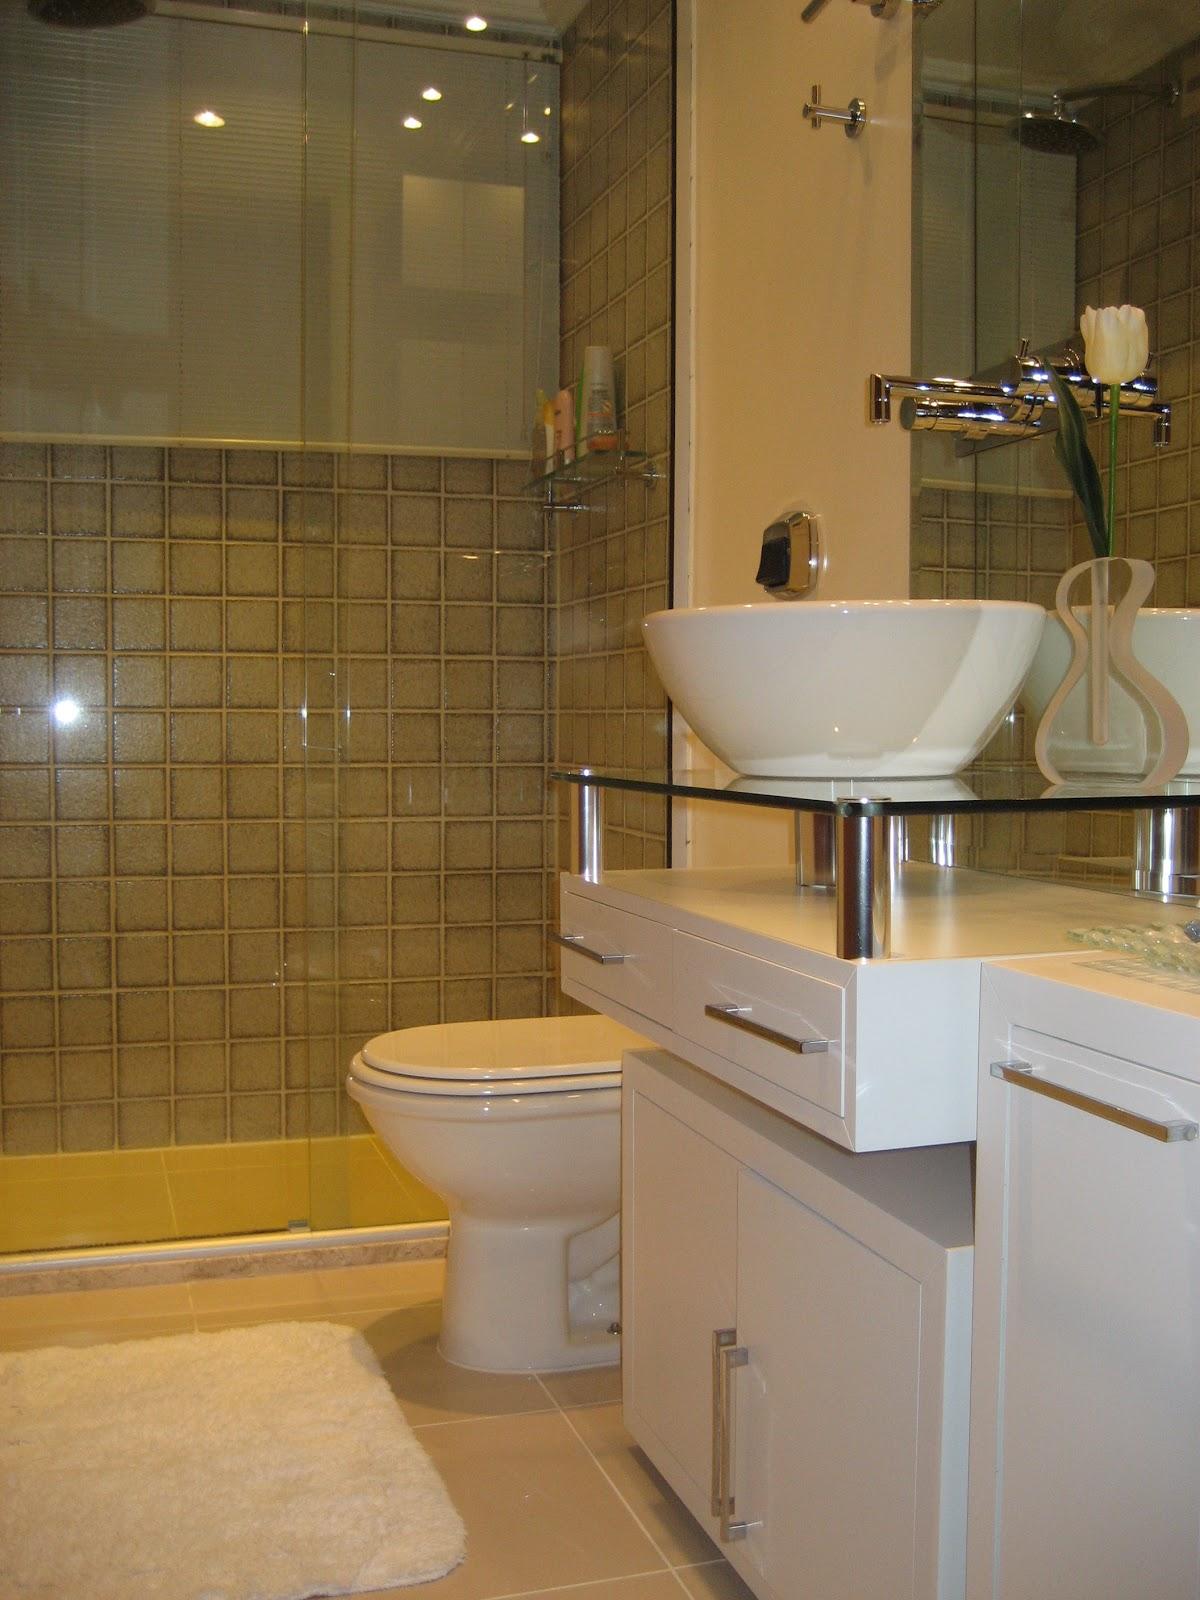 banheiro_social4m.jpg